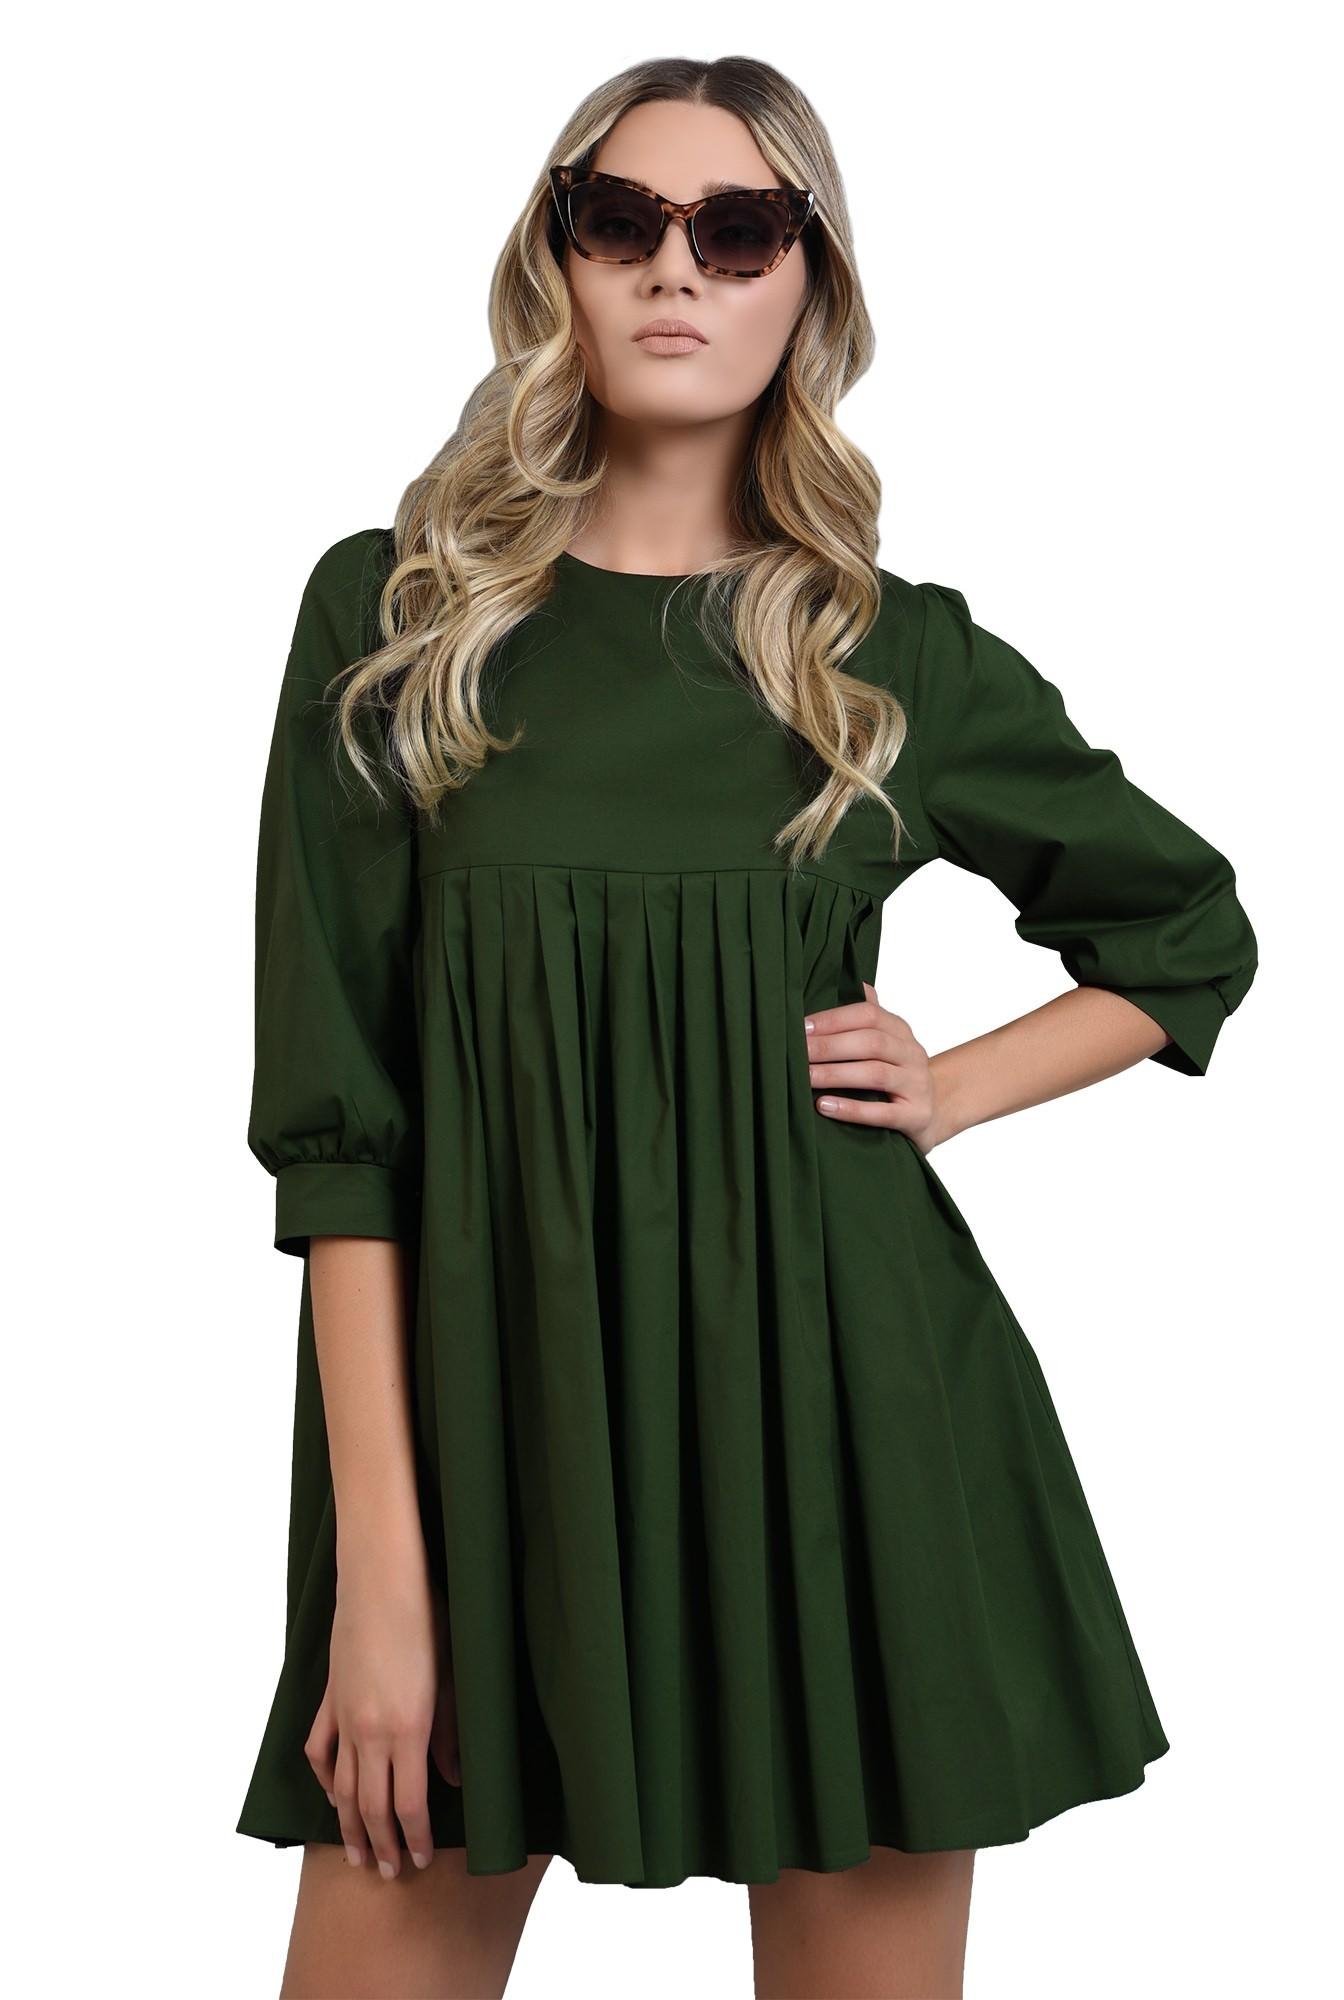 3 - rochie verde scurta, cu pliuri, Poema